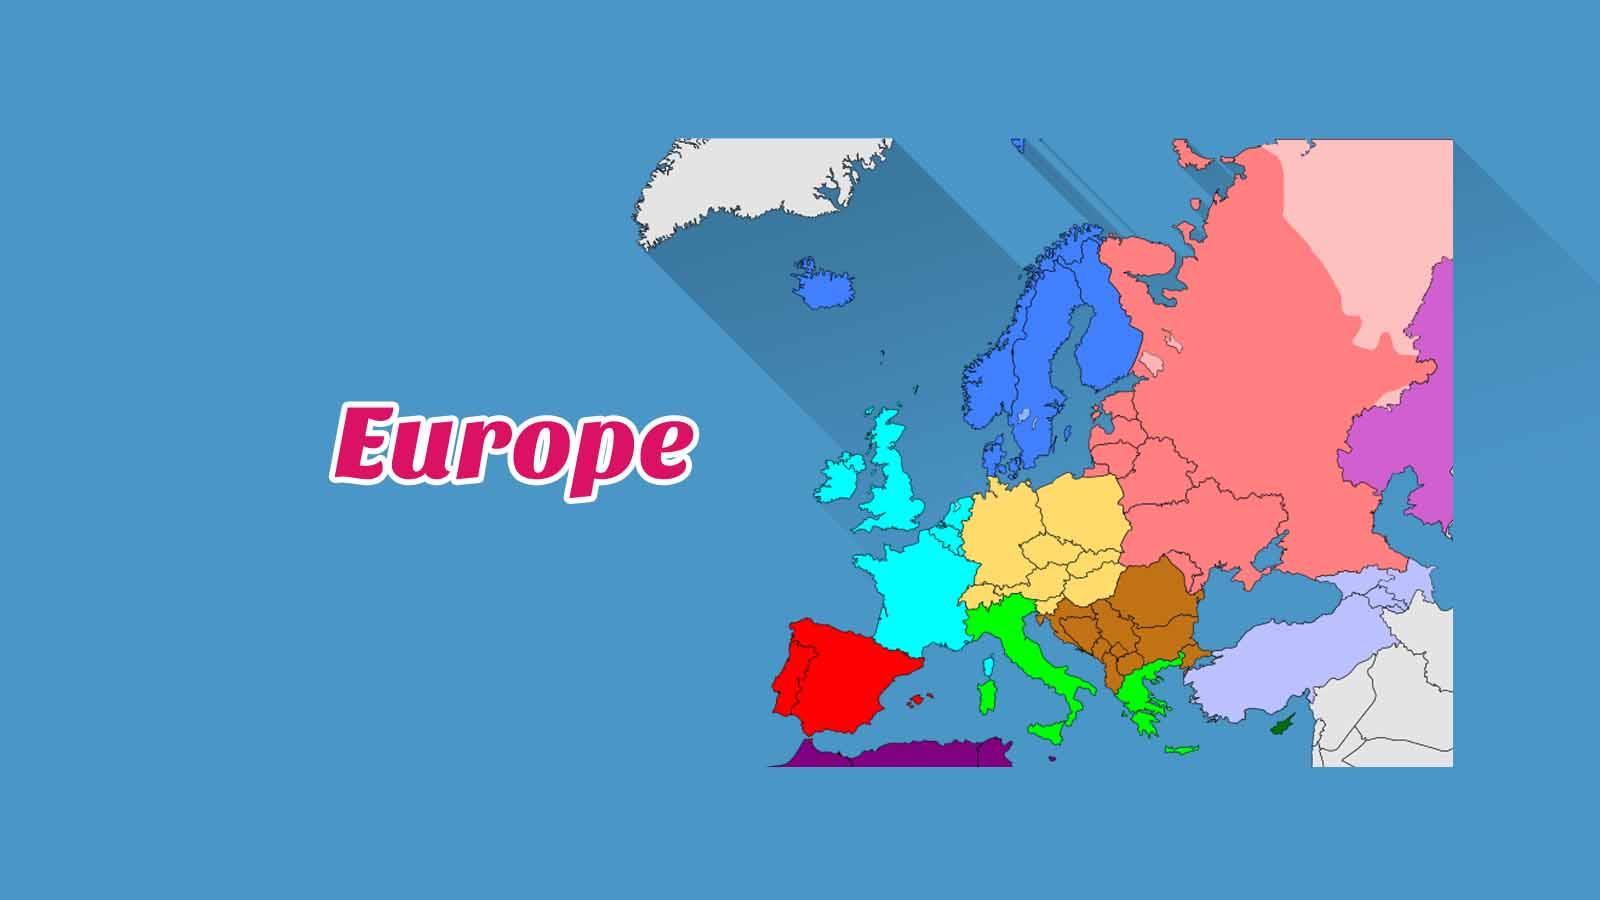 Kosakata Bahasa Inggris Negara Di Benua Eropa Disertai Gambar, Audio Dan Pronunciation